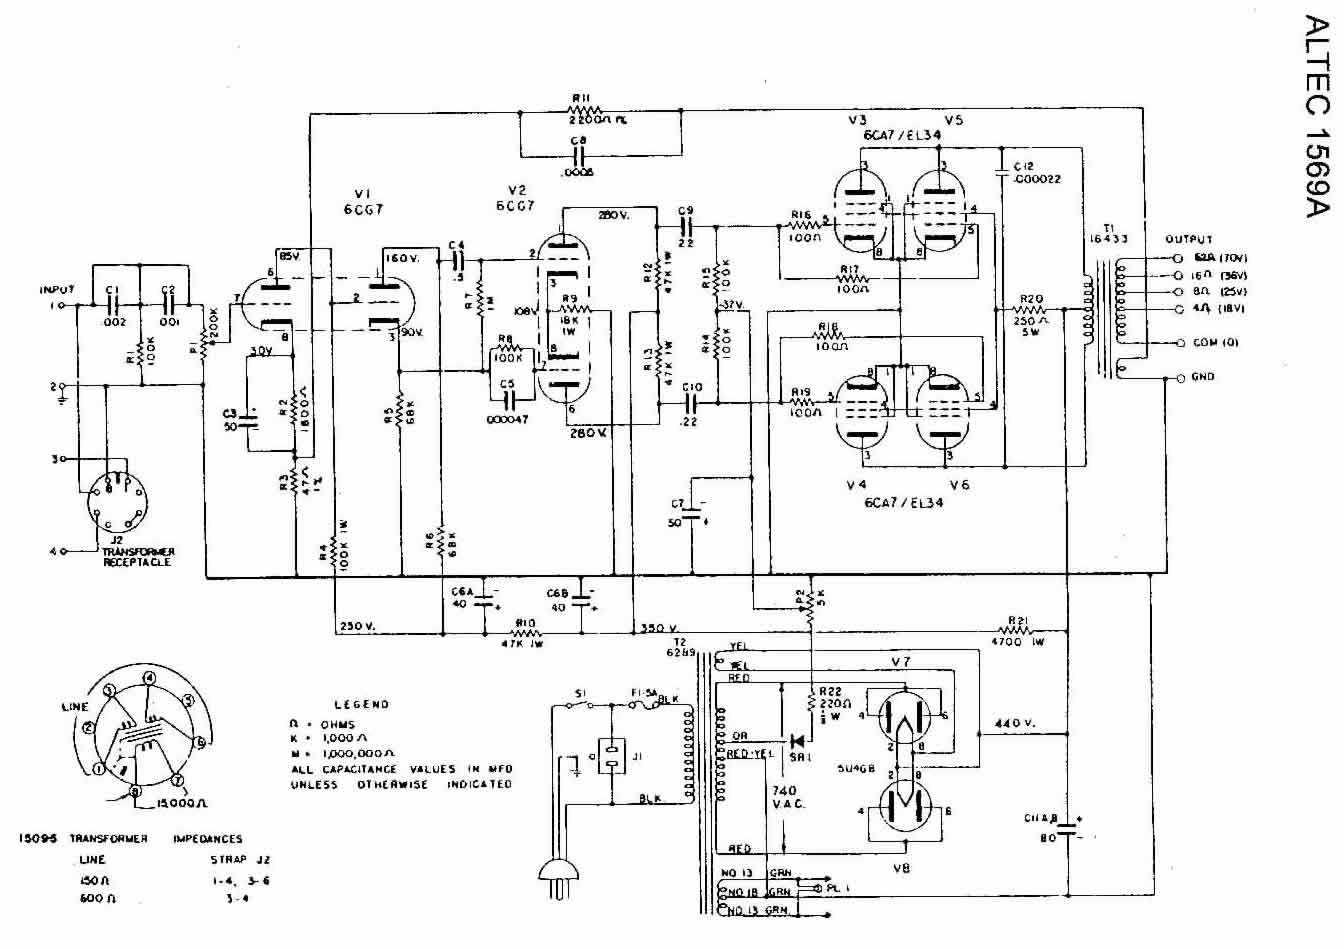 VN_8487] T Wiring Diagram Altec Download DiagramPhae Endut Blikvitt Librar Wiring 101